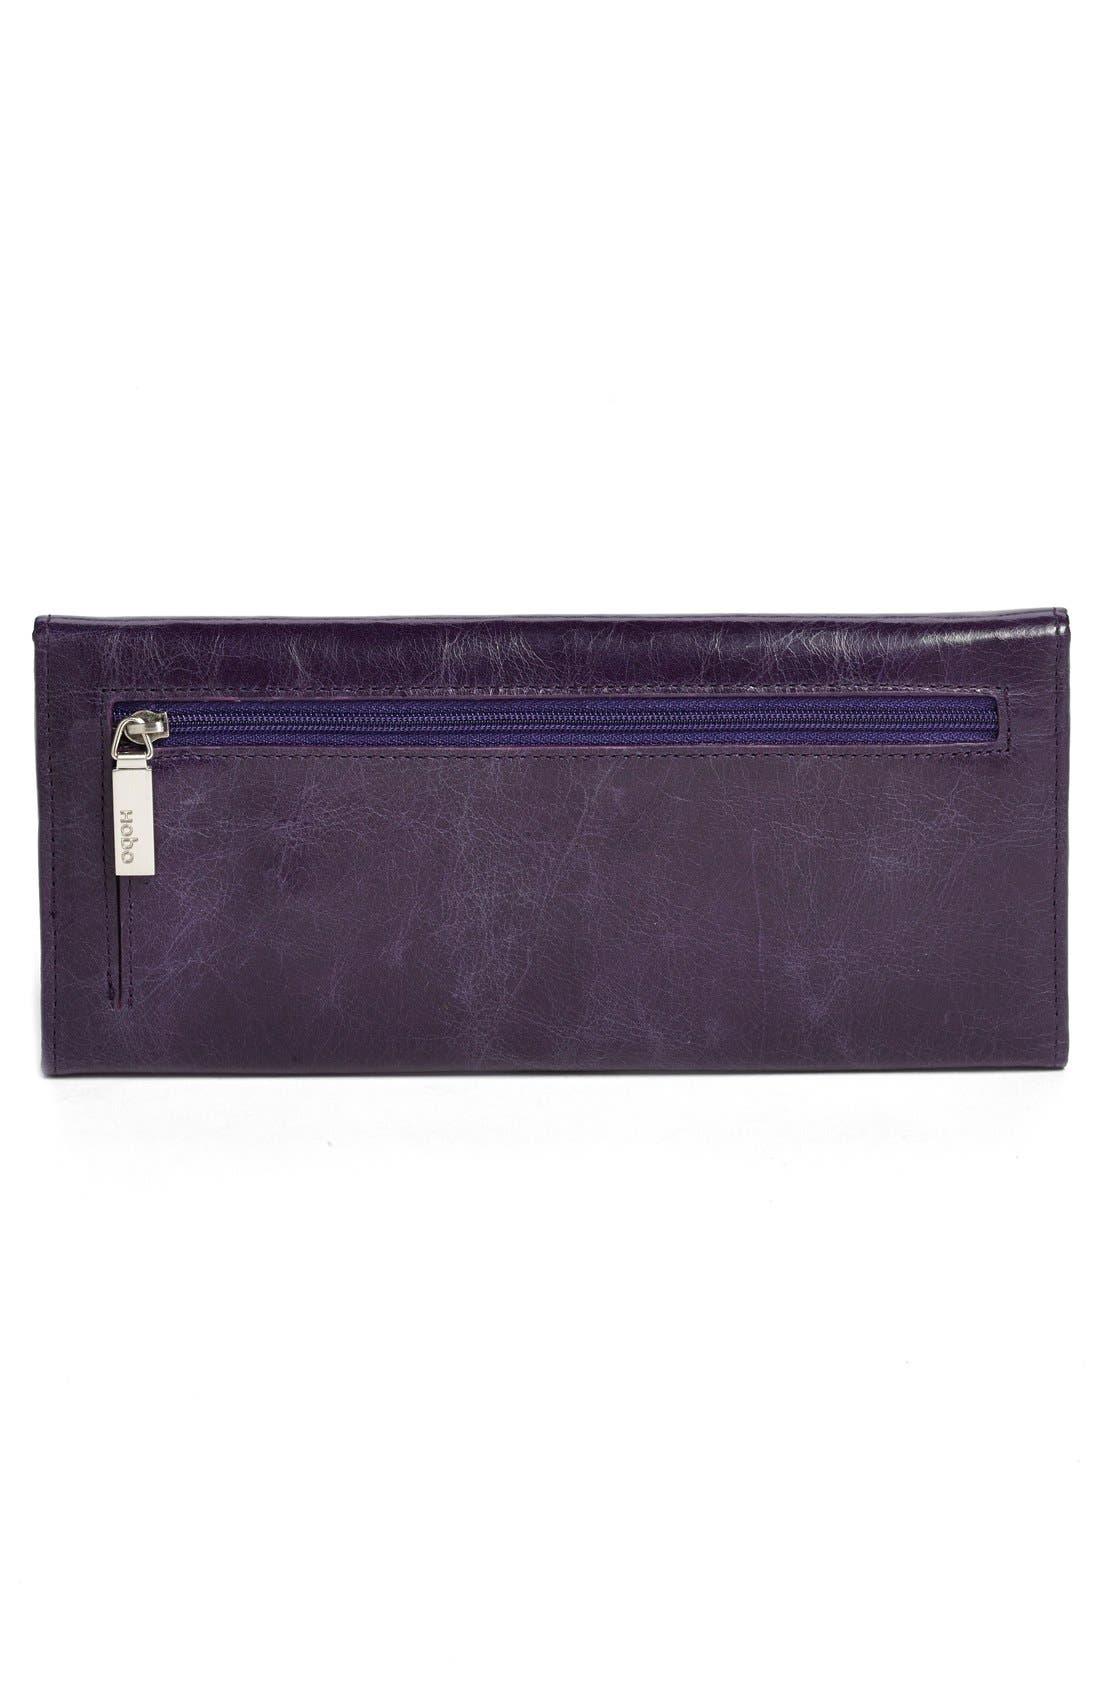 'Sadie' Leather Wallet,                             Alternate thumbnail 92, color,